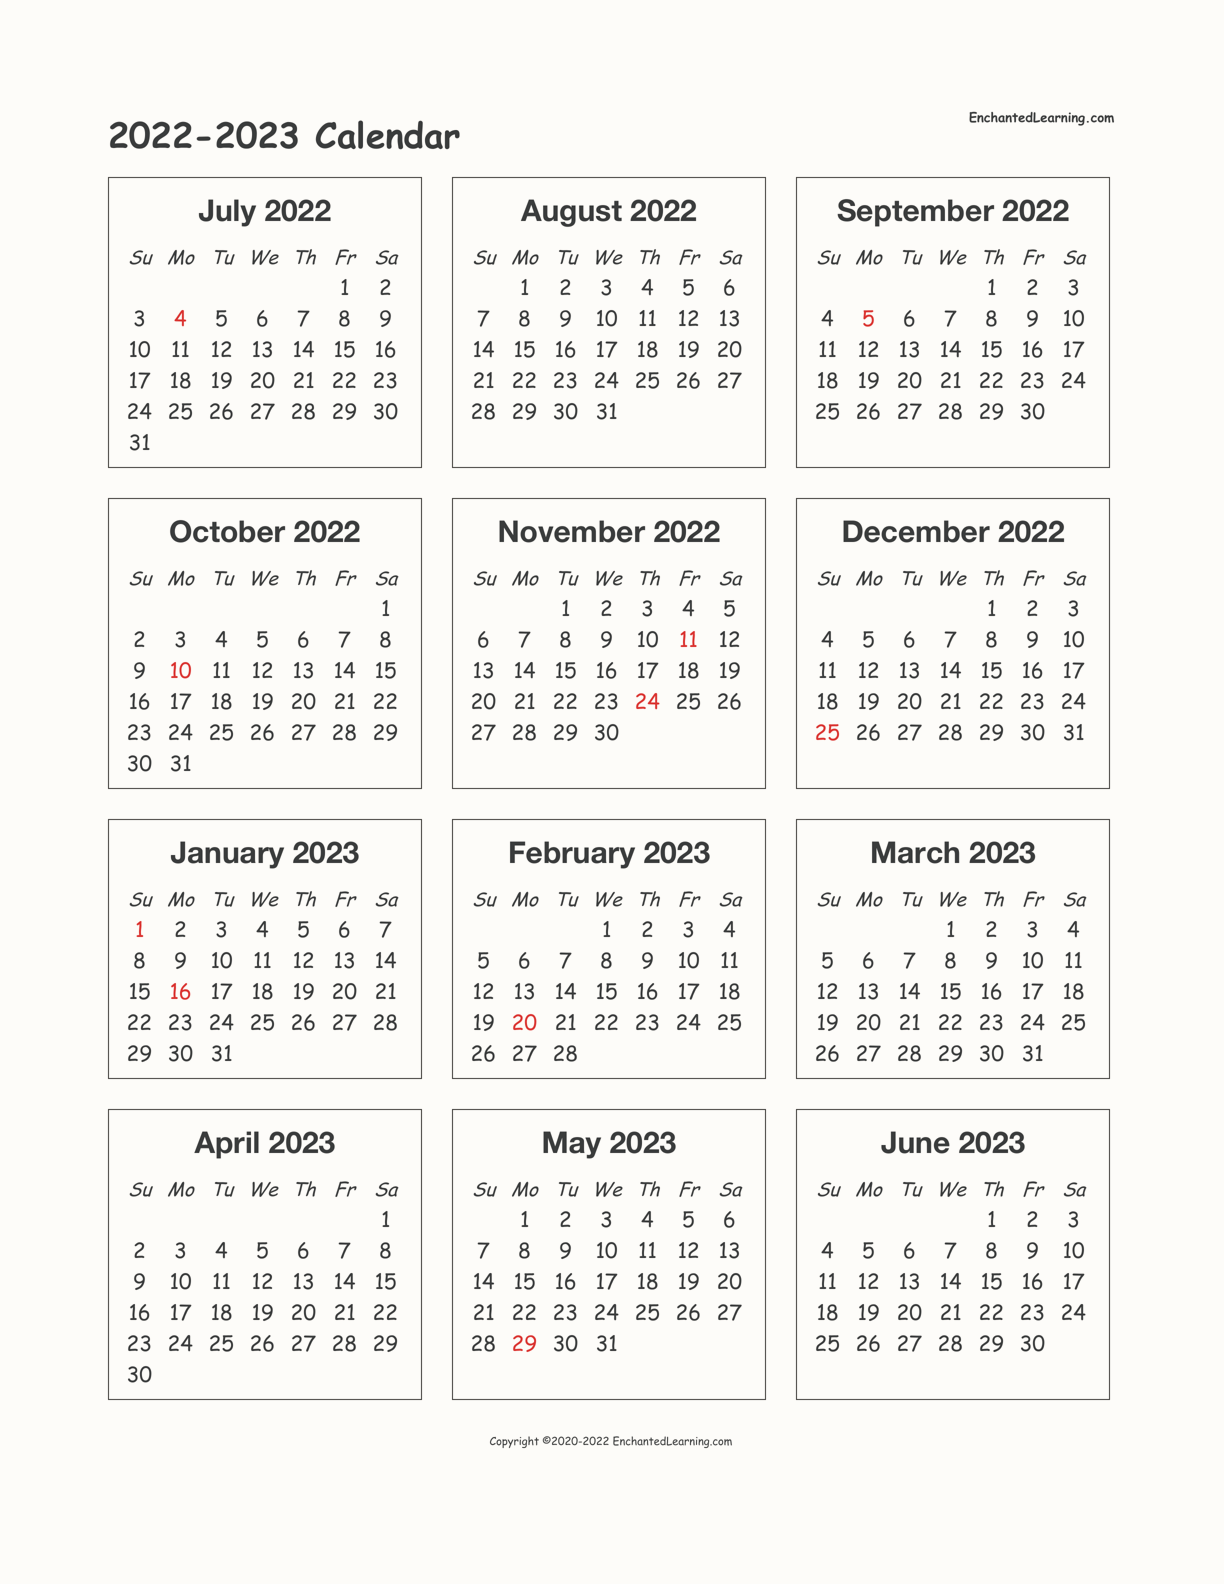 Calendar 2022 2023.2022 2023 School Year One Page Calendar Enchanted Learning